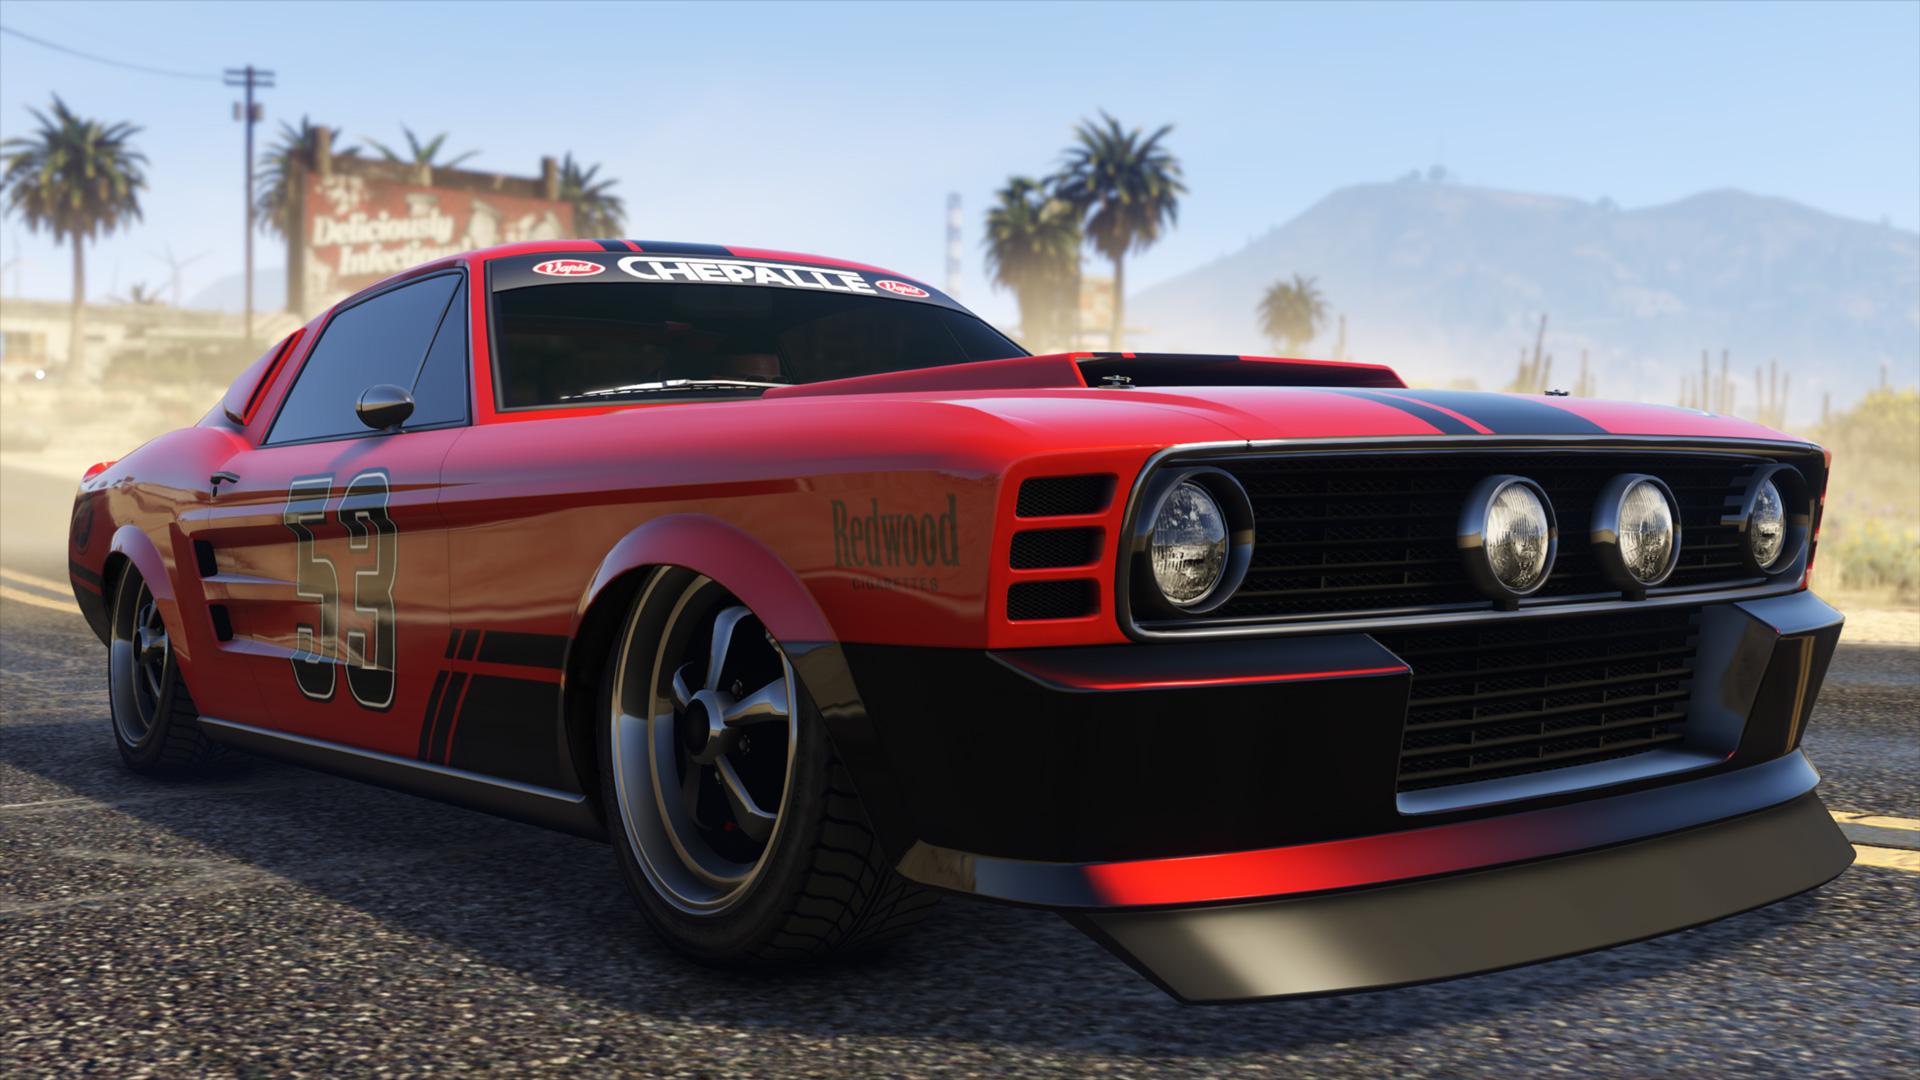 Gta 5 Cars On Twitter Gta 5 Dlc Car Vapid Blade – Desenhos Para Colorir